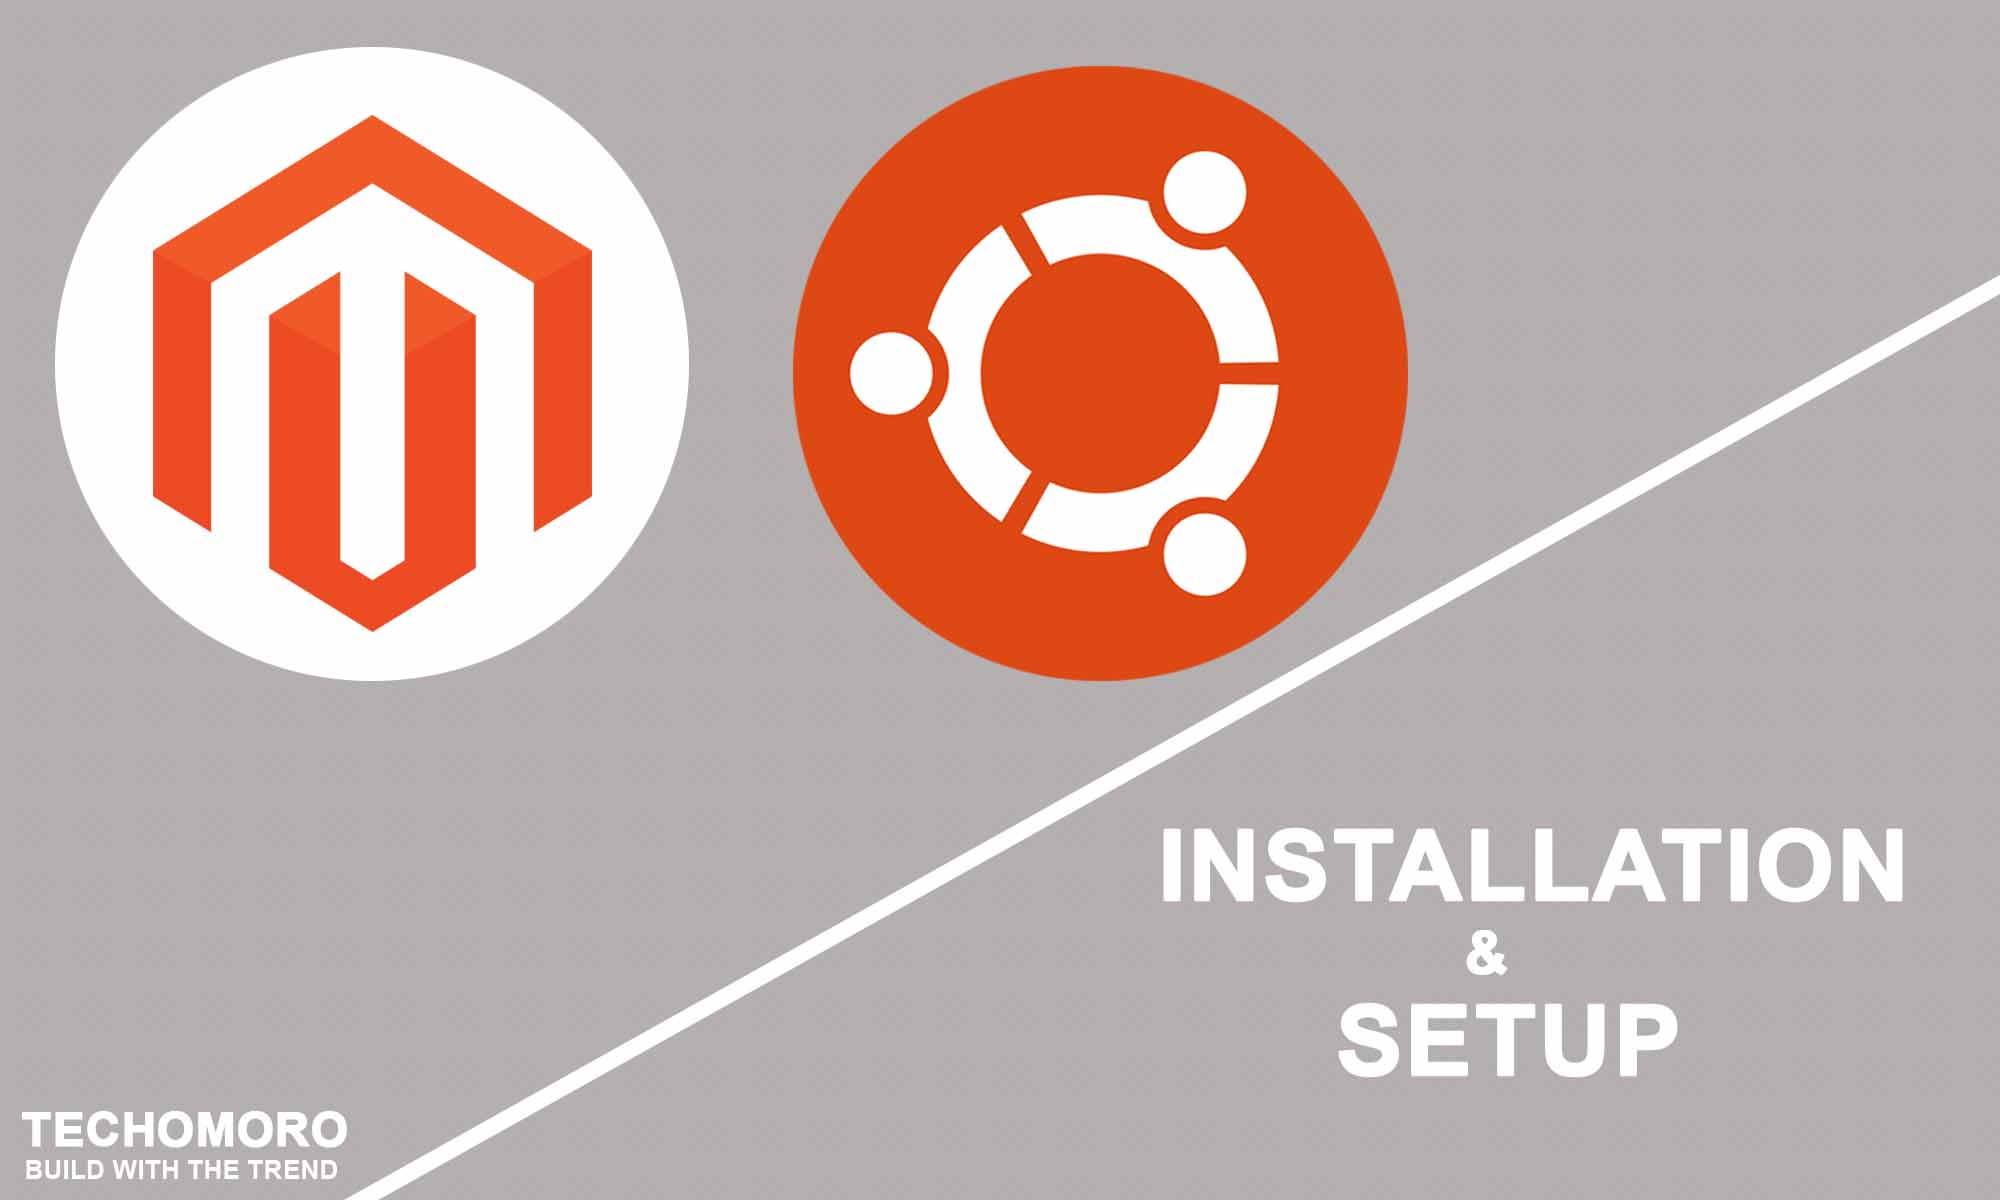 How to Install and Setup Magento 2 on Ubuntu 17.10